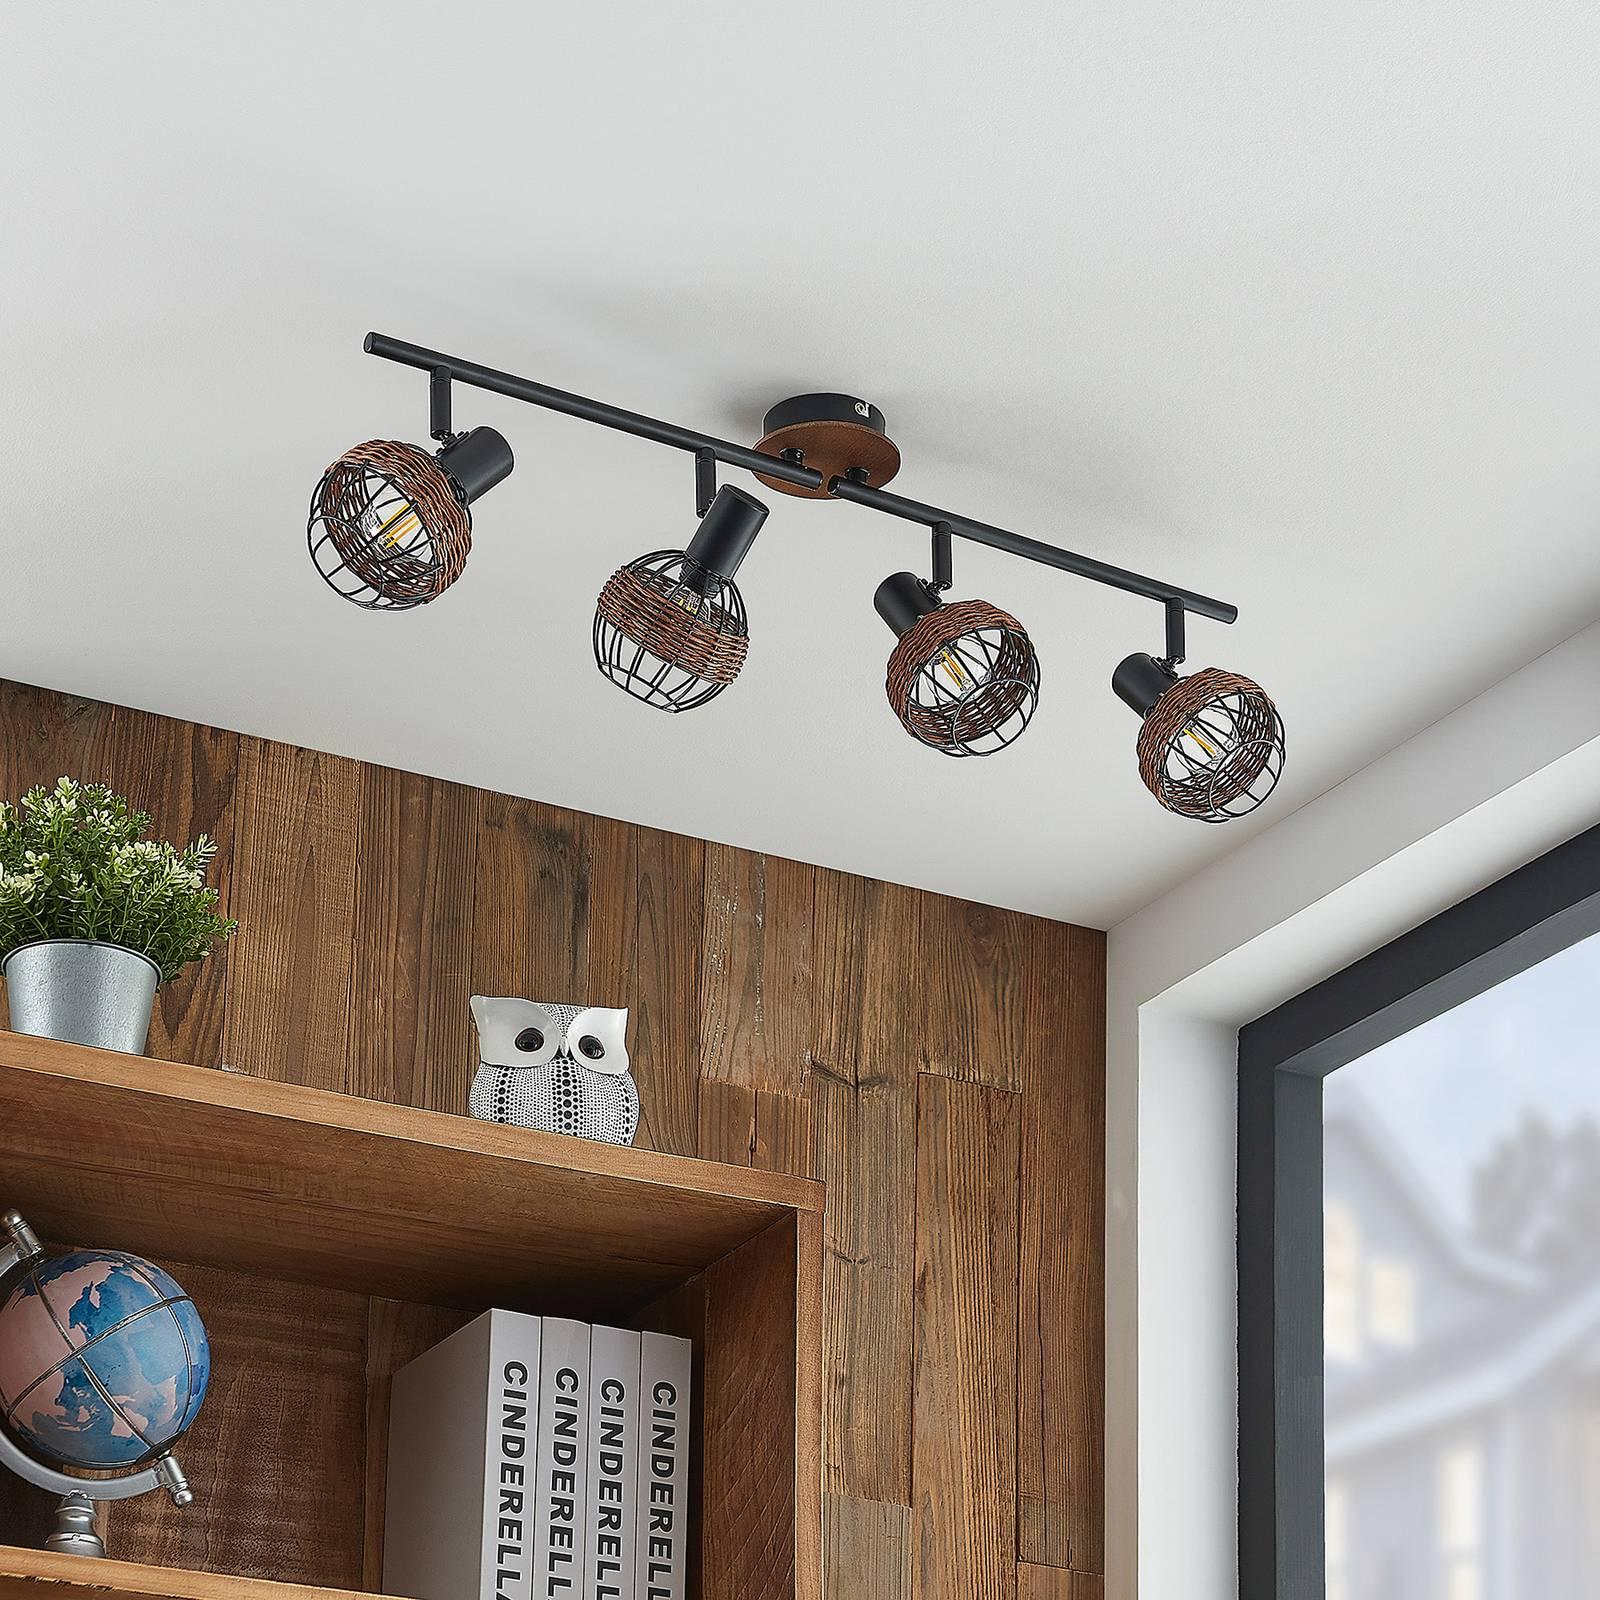 Lindby Nermina -kohdevalaisin rottinkia, 4 lamppua